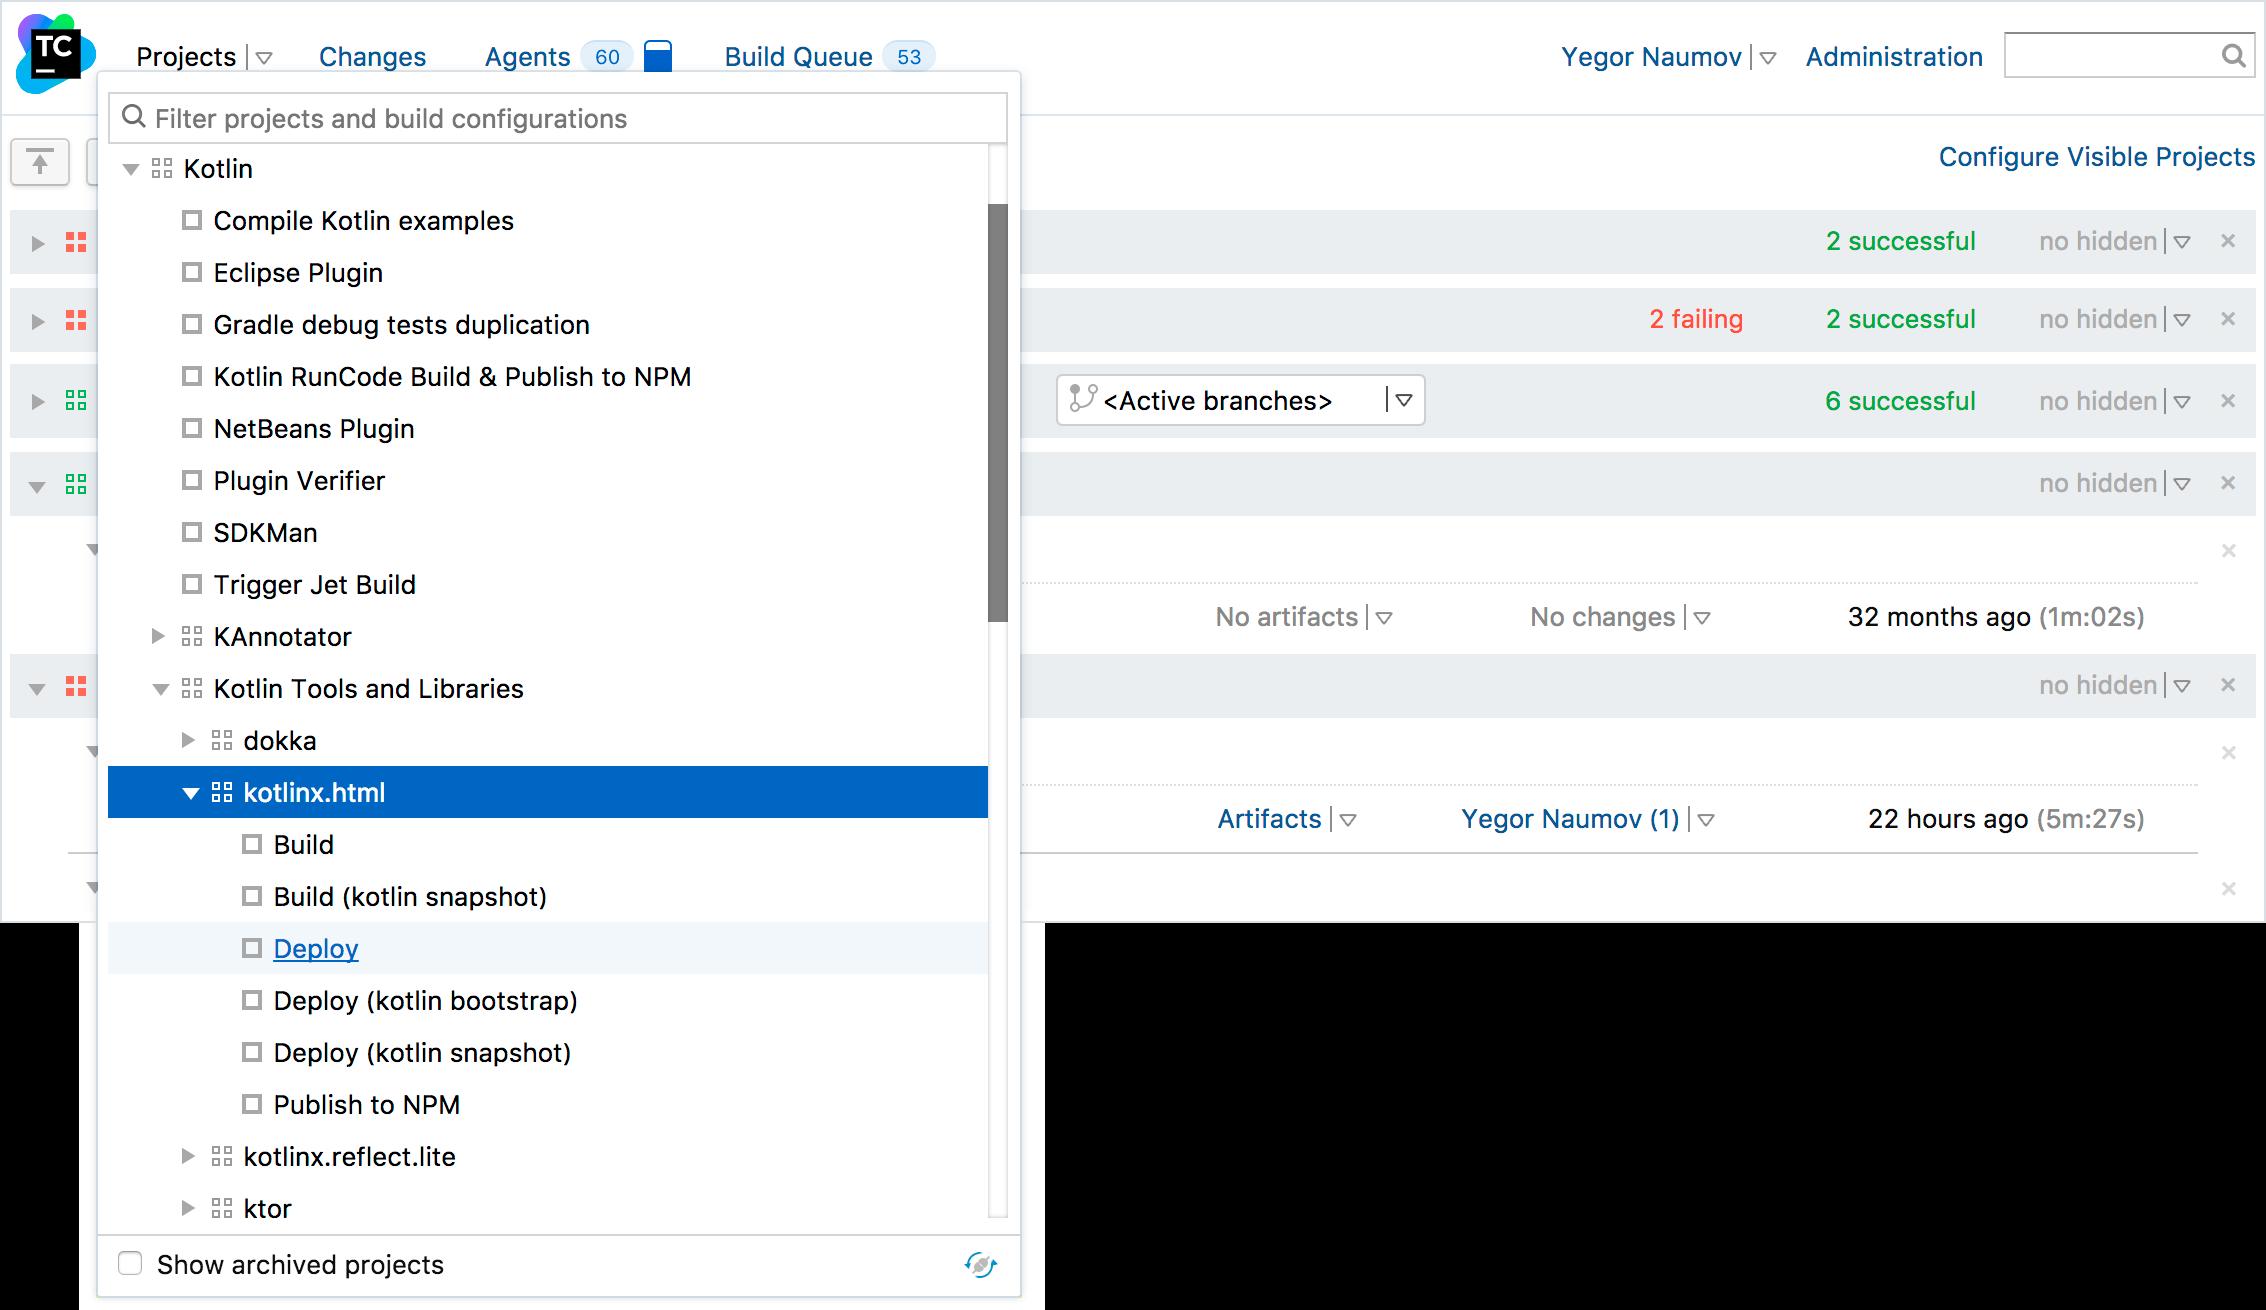 TeamCity Interface